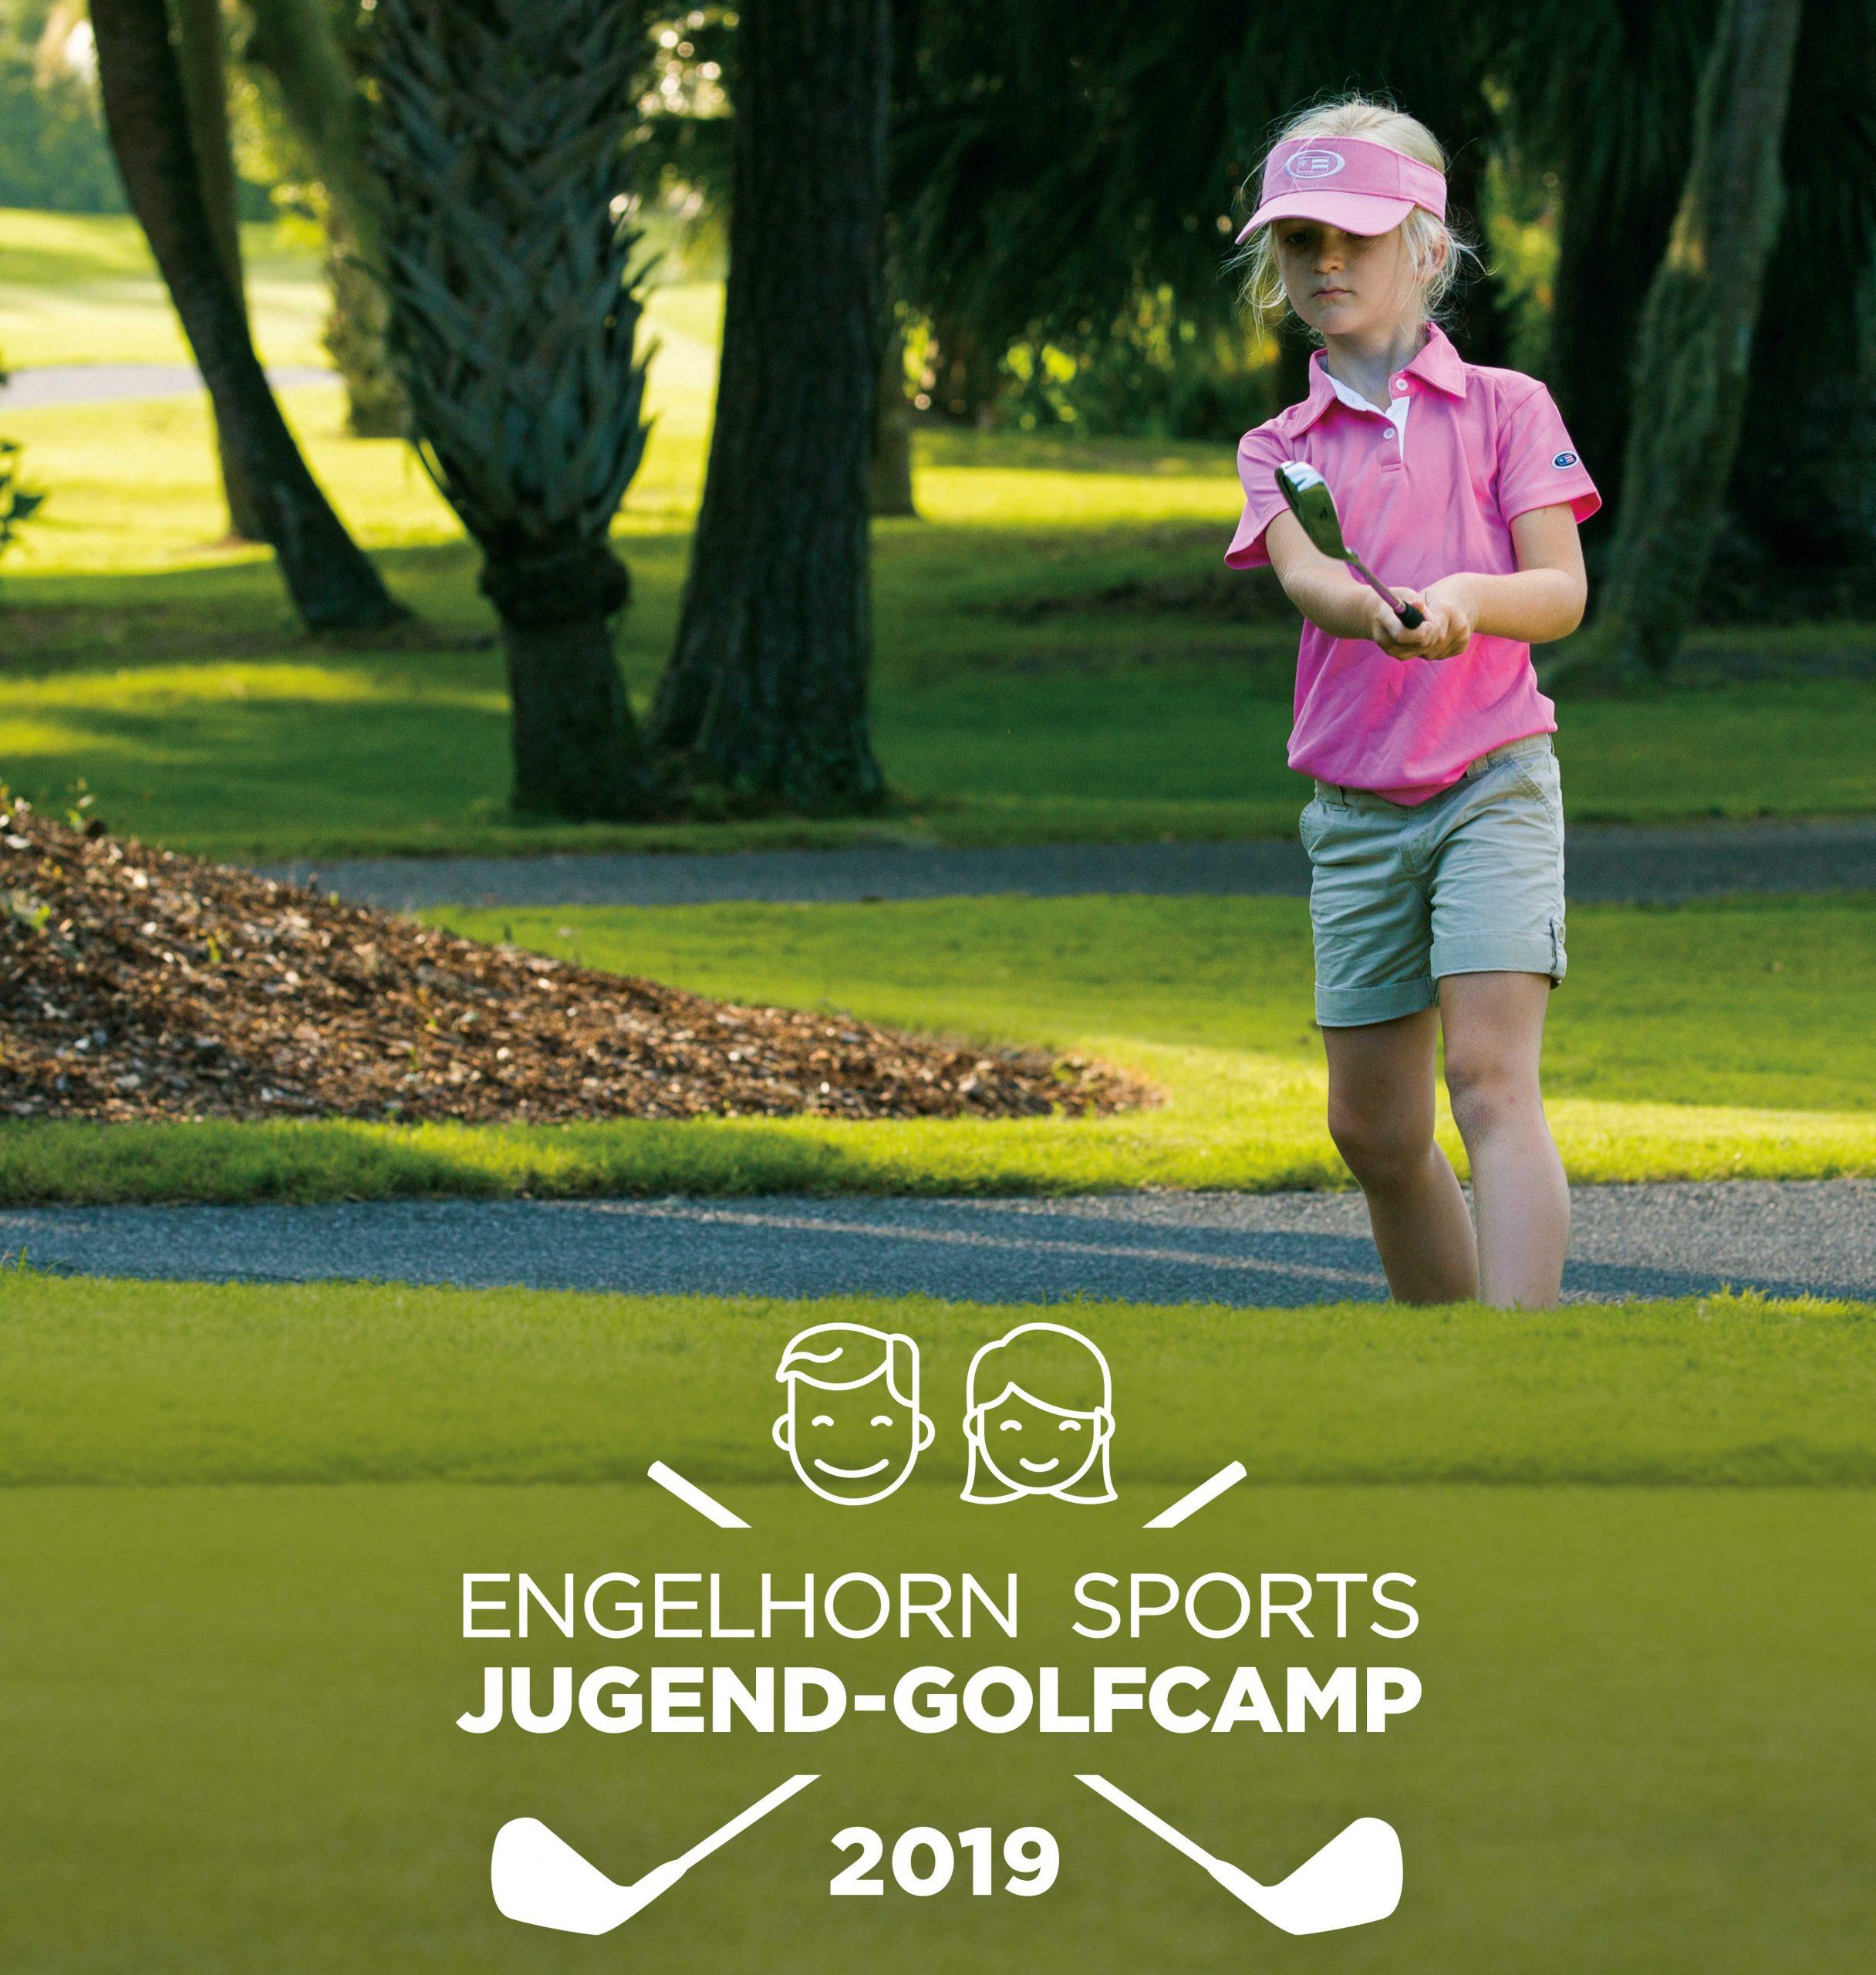 engelhorn sports Jugend-Golfcamp 2019